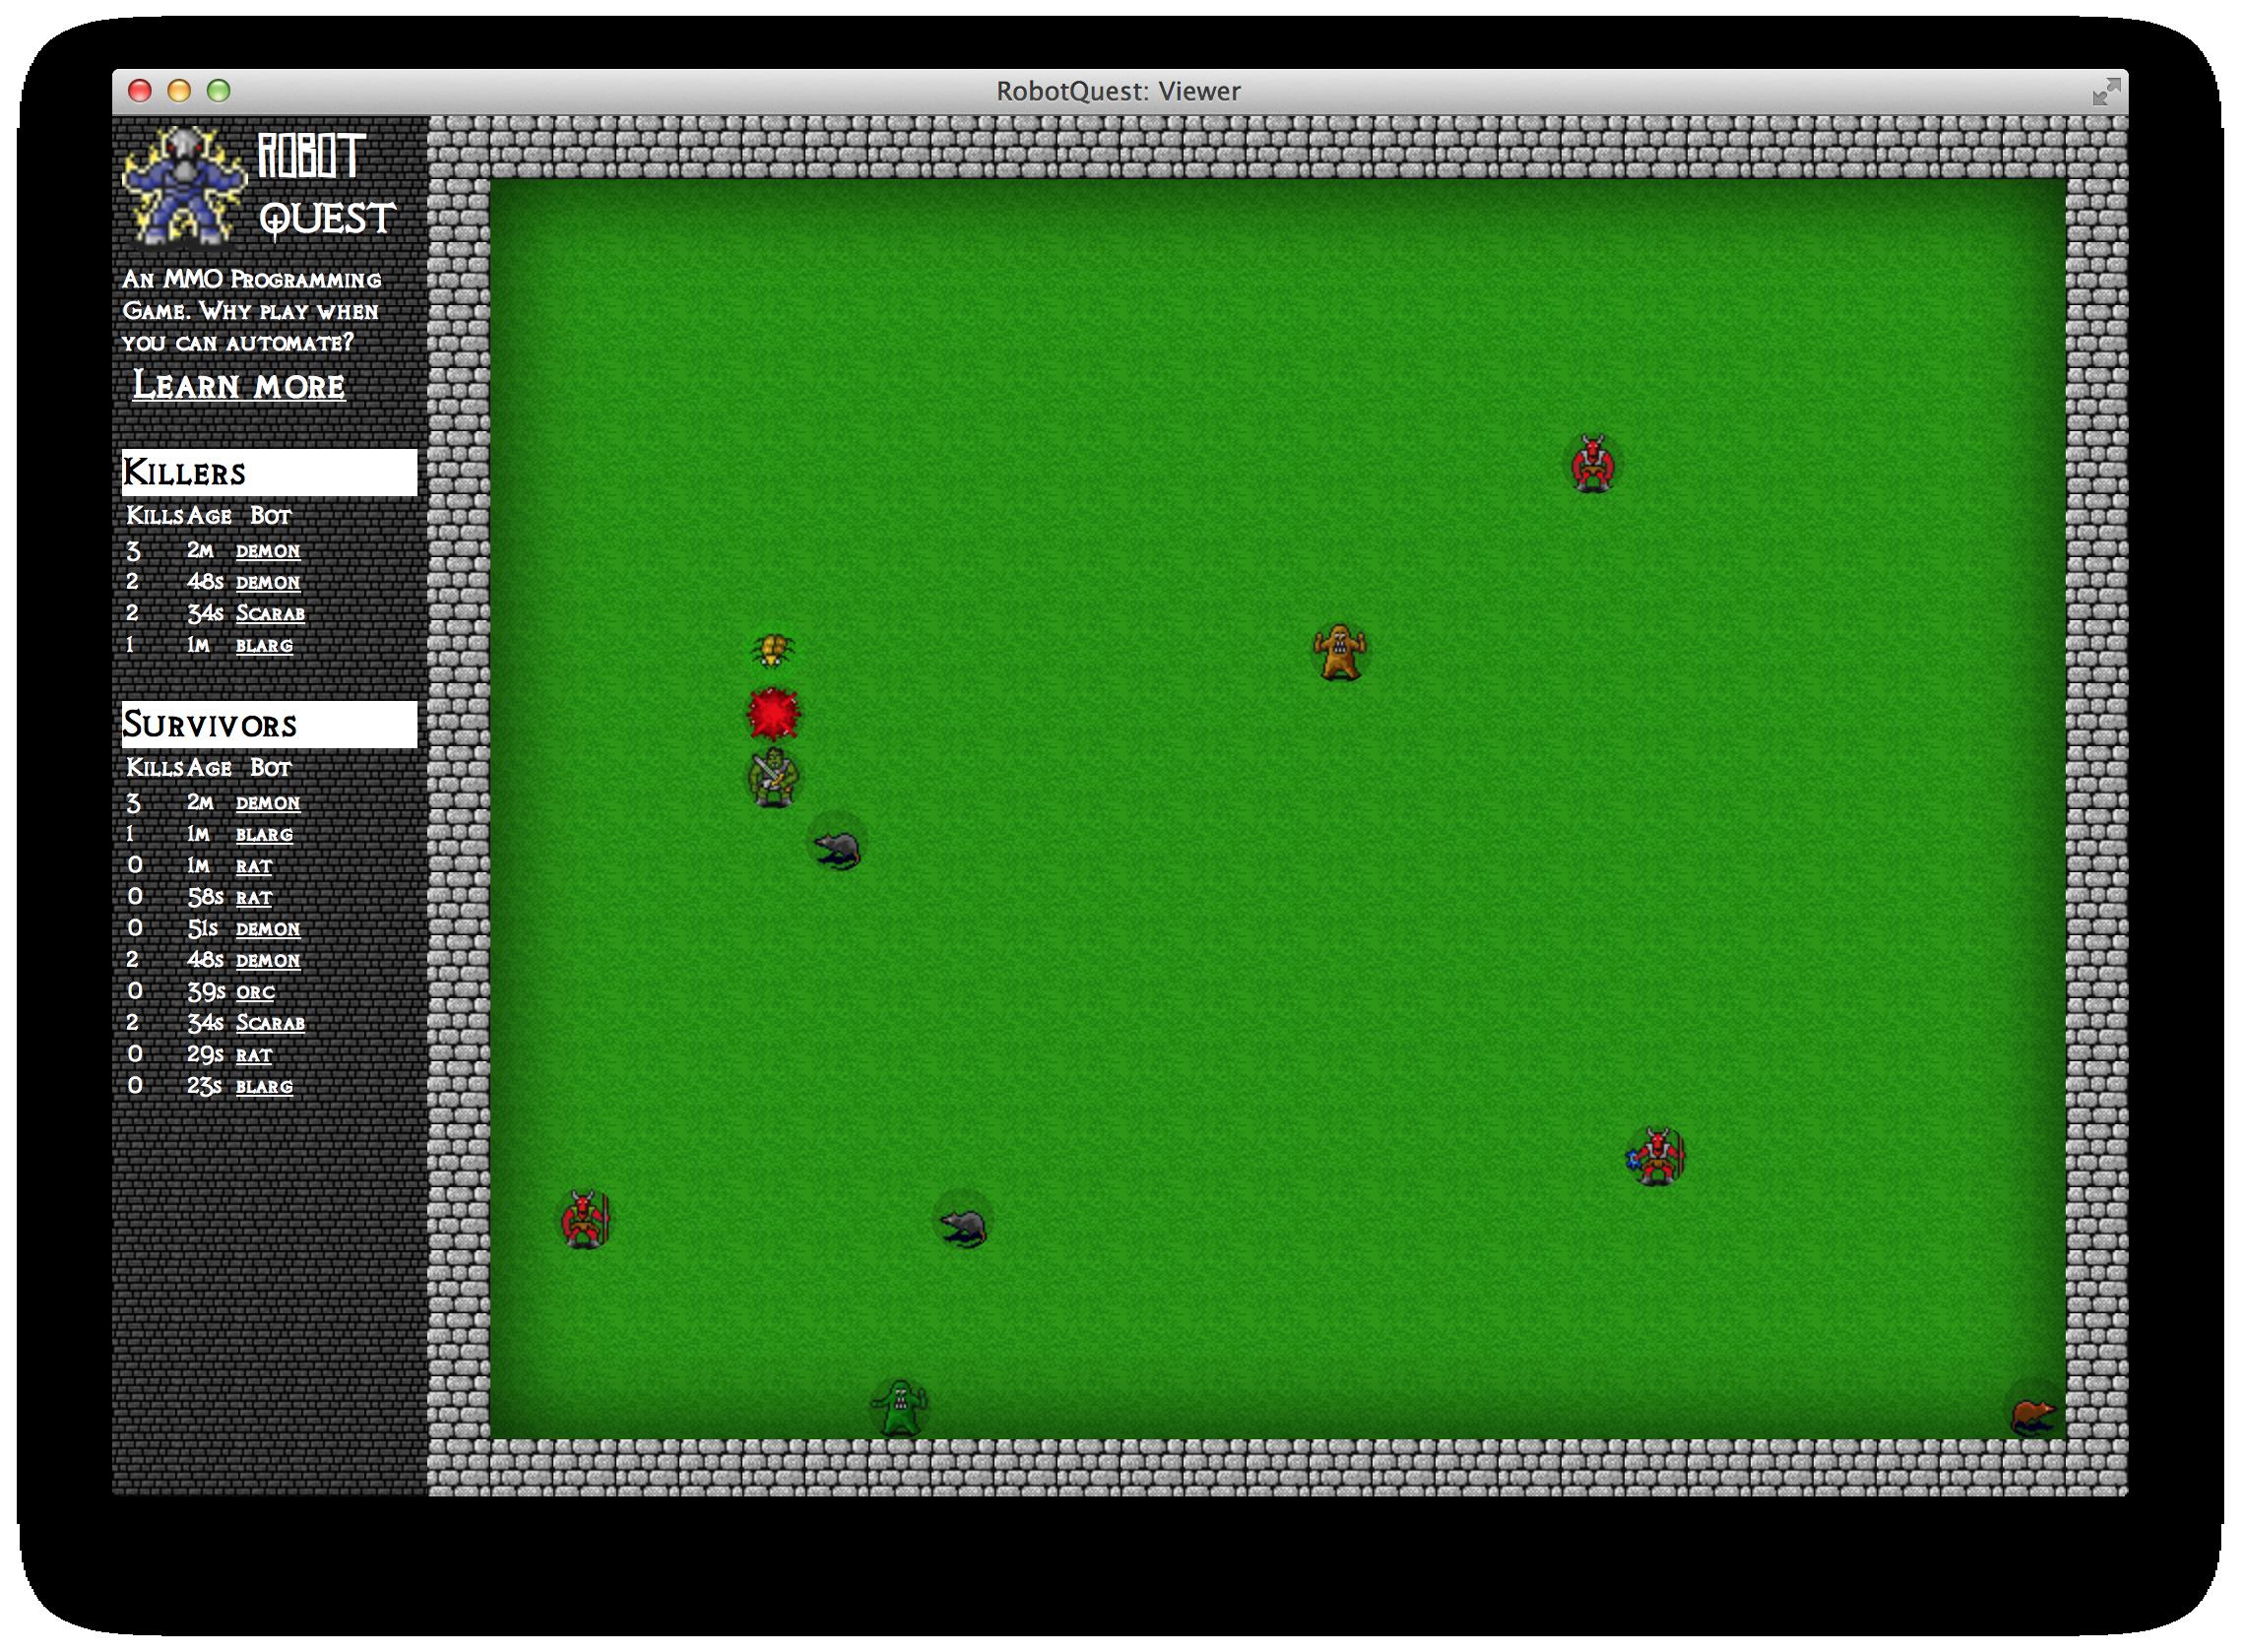 GitHub - seanhess/robotquest: RobotQuest is a MMO, programming game